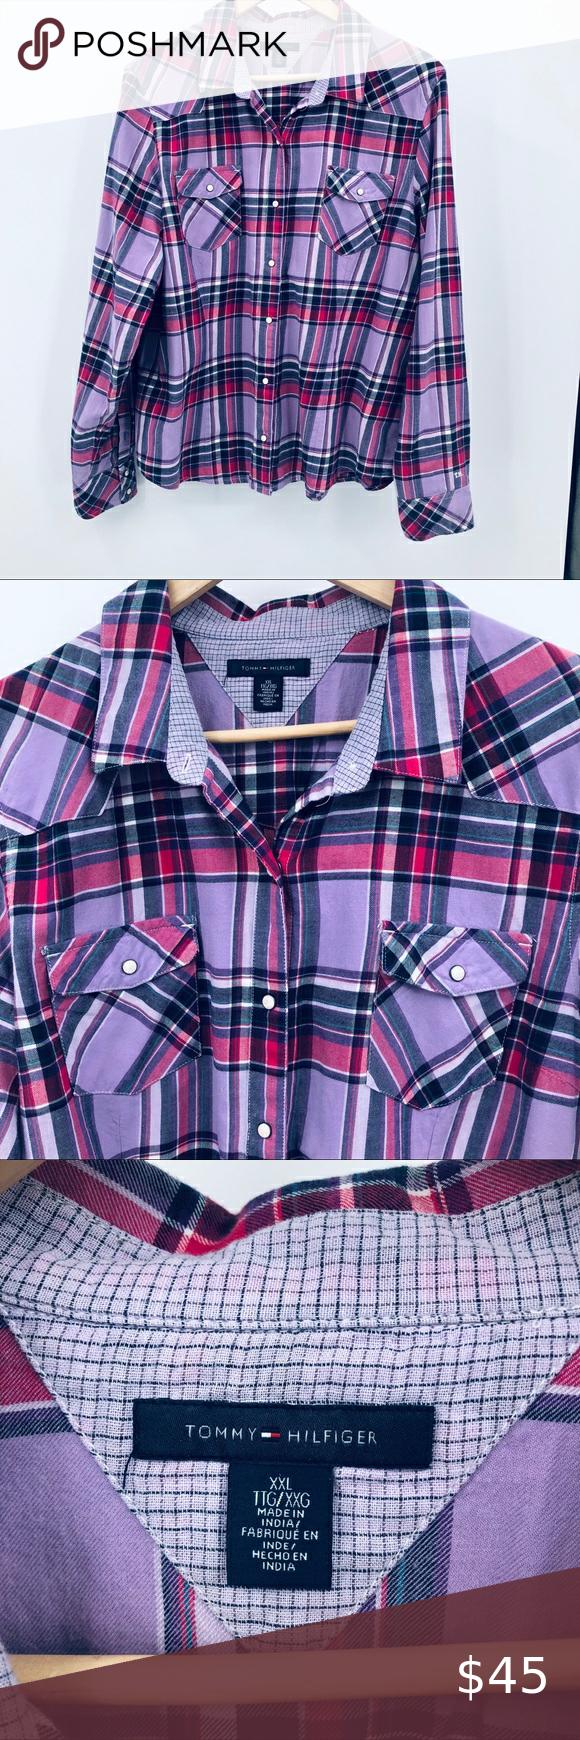 Tommy Hilfiger Women Plaid Purple Pearlsnap Shirt Tommy Hilfiger Women S Purple Plaid Shirt Pearl Snap F Tommy Hilfiger Women Purple Plaid Shirt Tommy Hilfiger [ 1740 x 580 Pixel ]